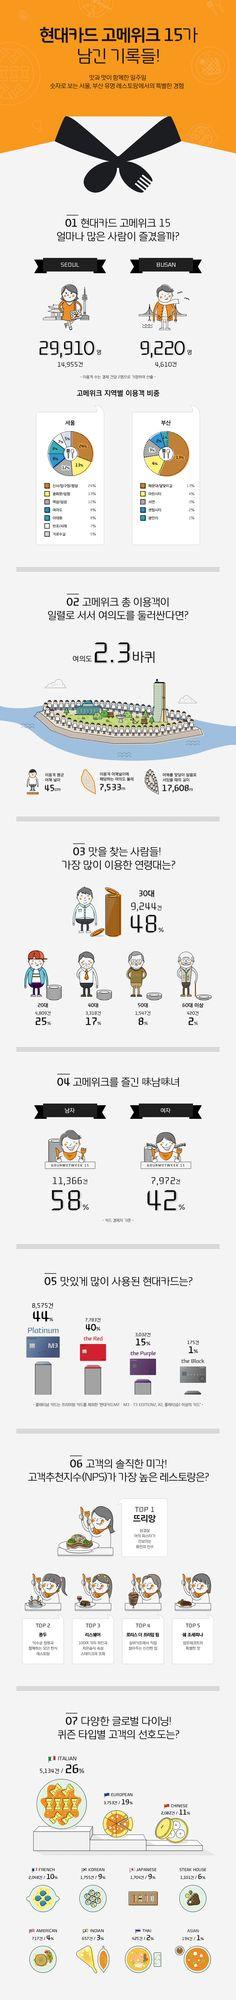 [HyundaiCard Blog] Gomeweek